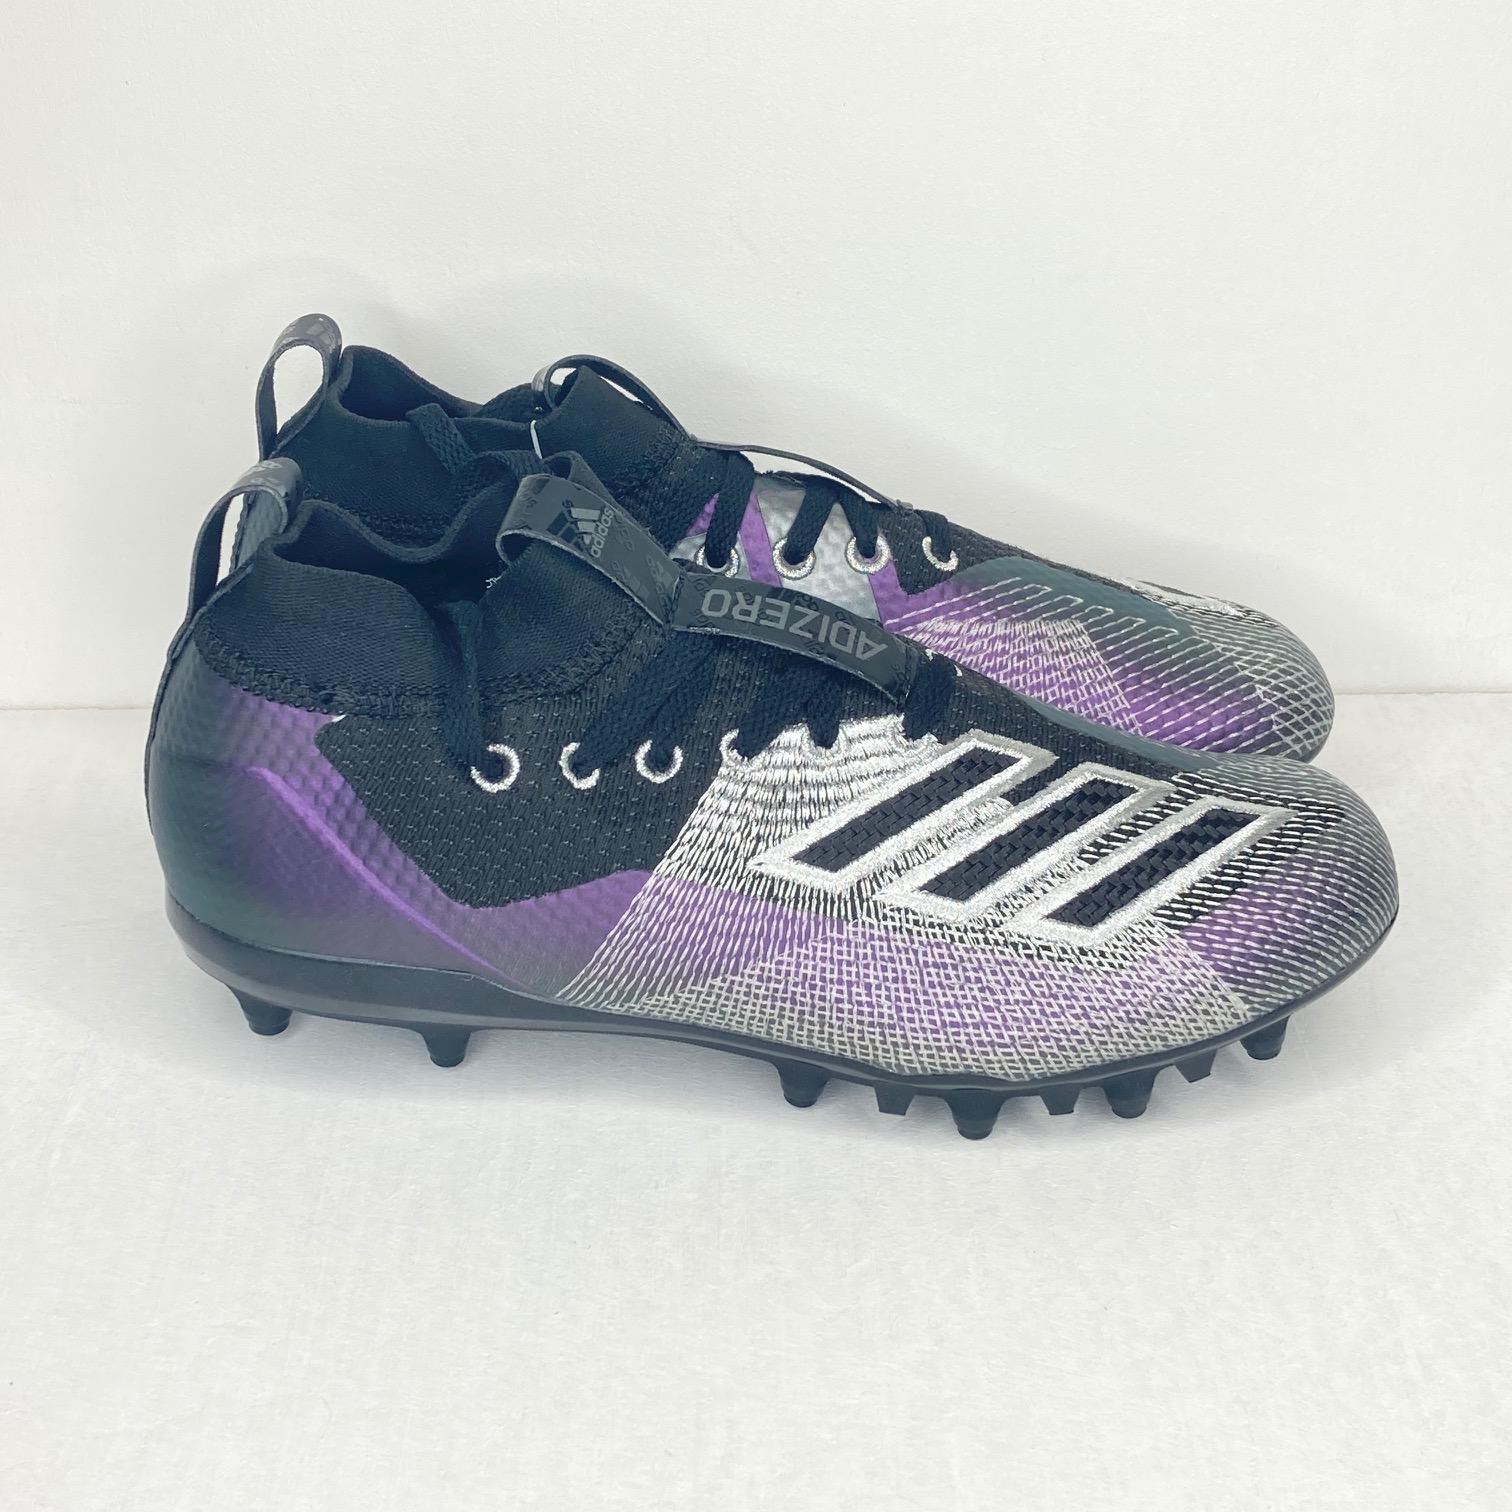 ADIDAS AdiZero 8.0J Soccer Cleats Black//Purple Chameleon Youth Sizes F36735